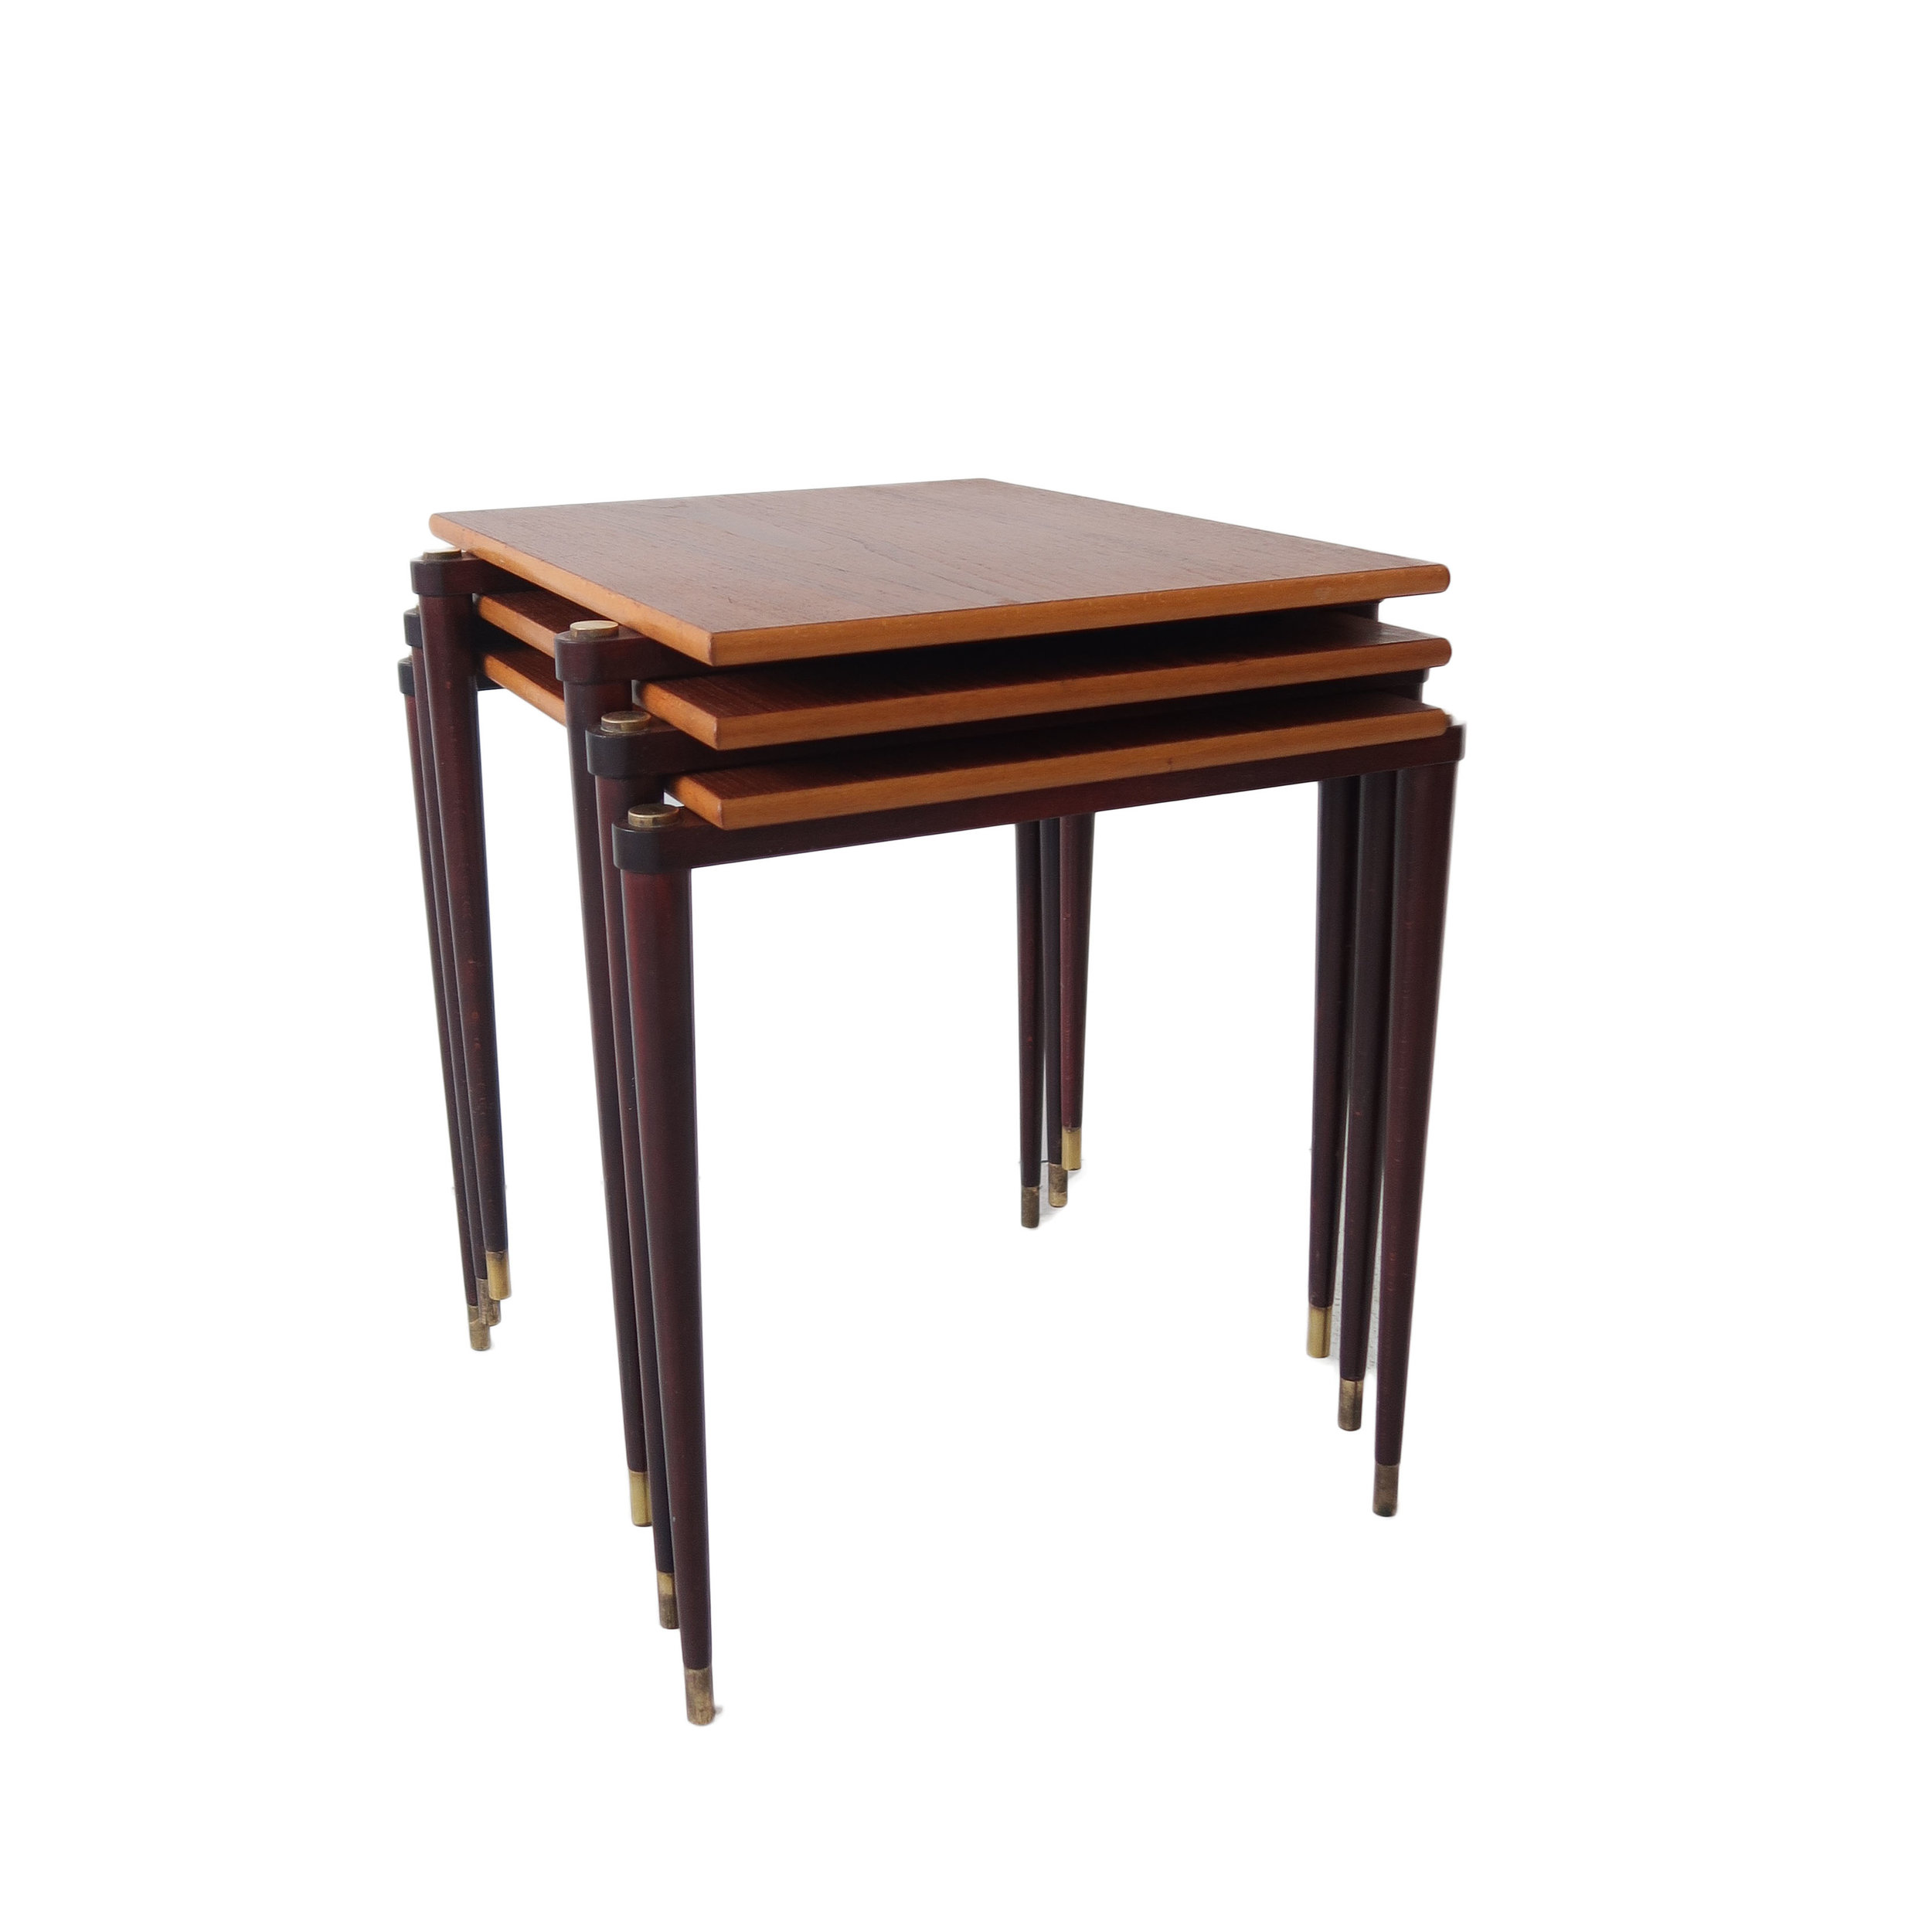 vintage mid century moder teak stacking tables.jpg